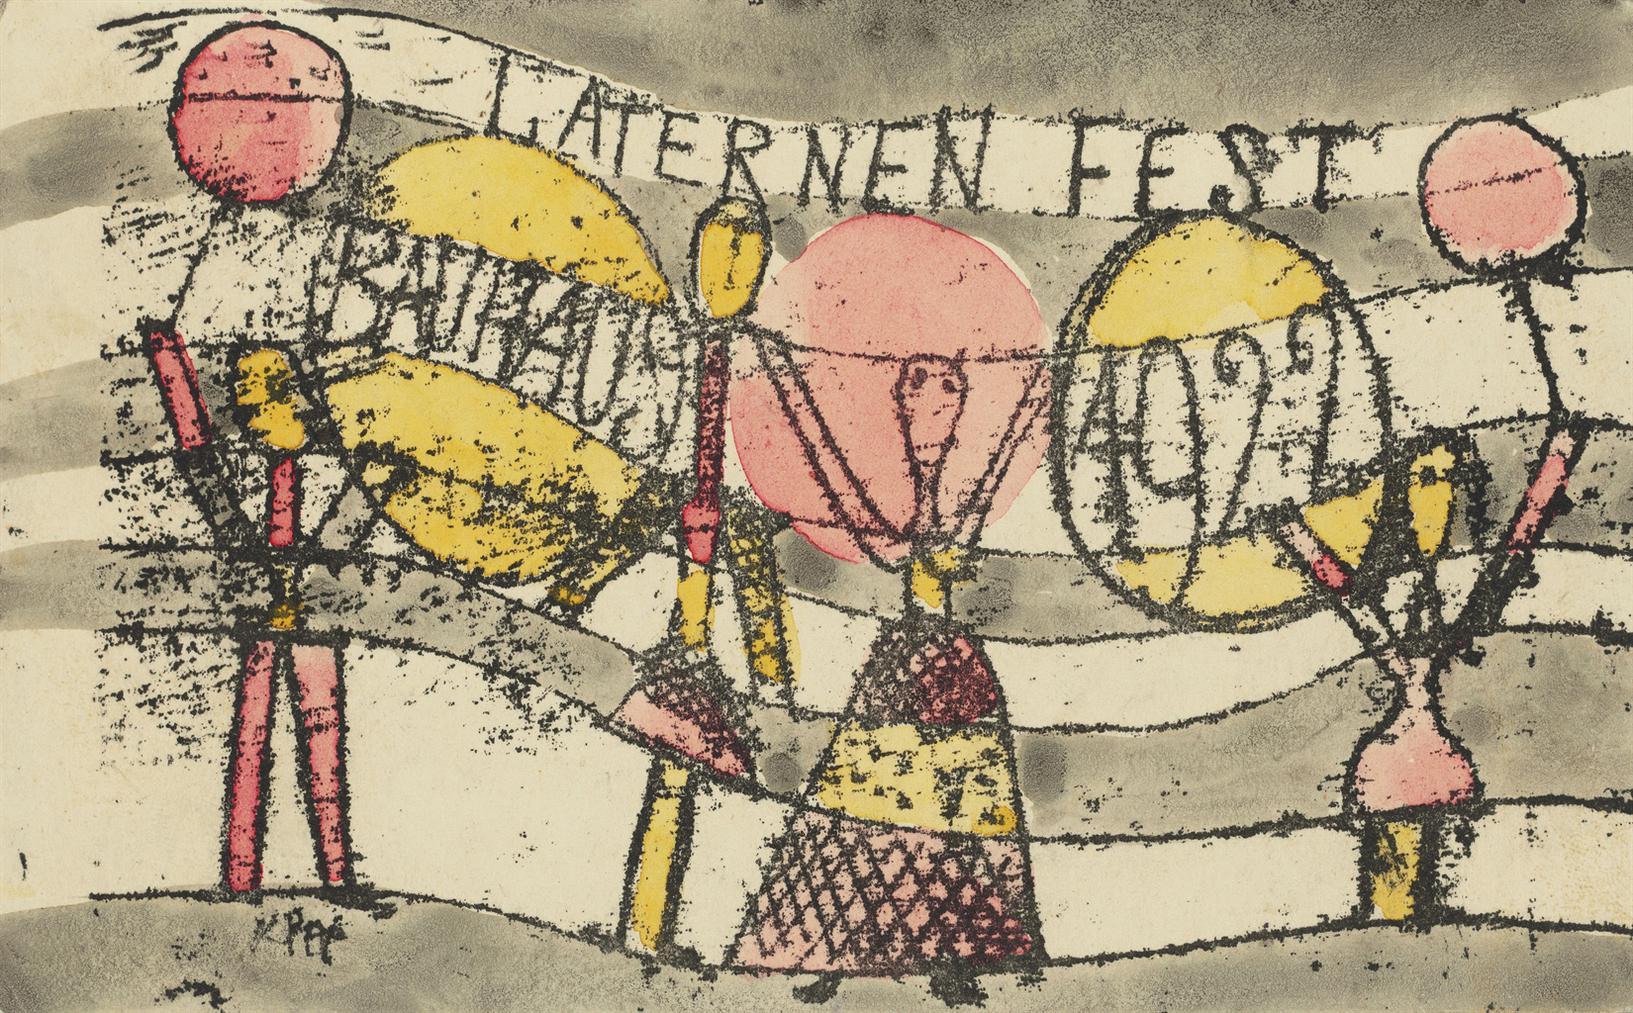 Paul Klee-Laternenfest Bauhaus (Bauhaus Lanterns Festival)-1922